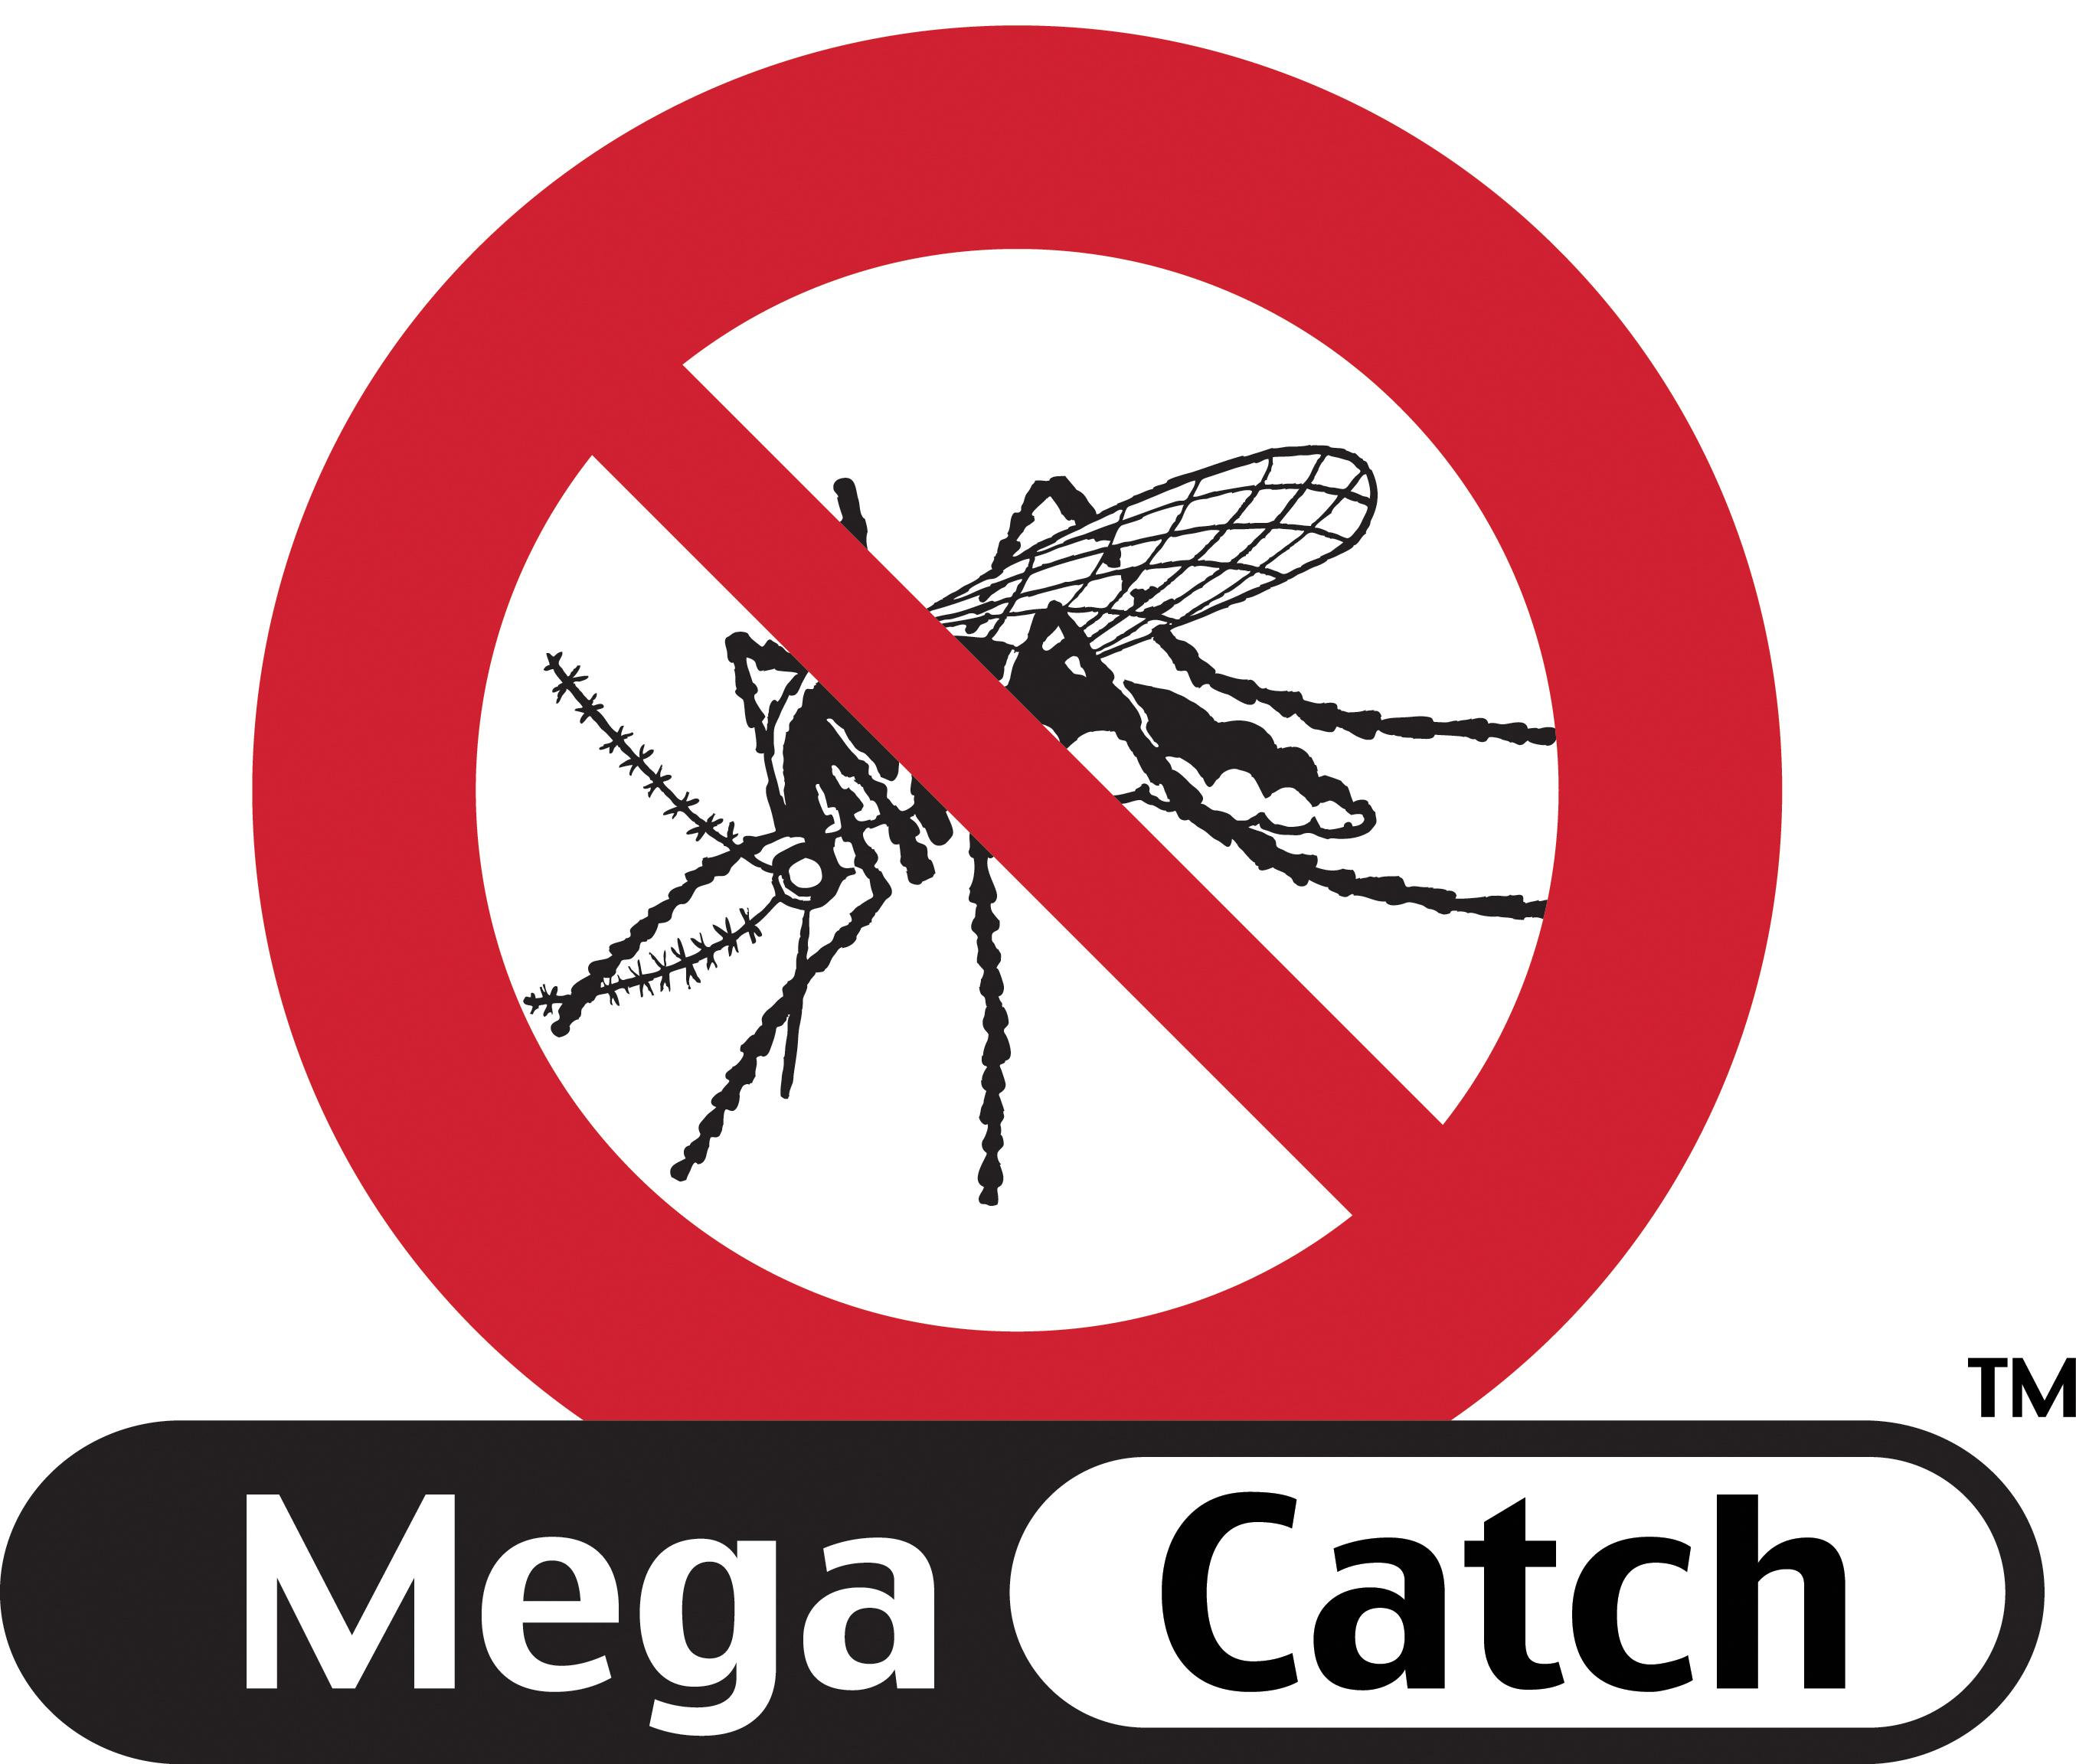 Megacatch